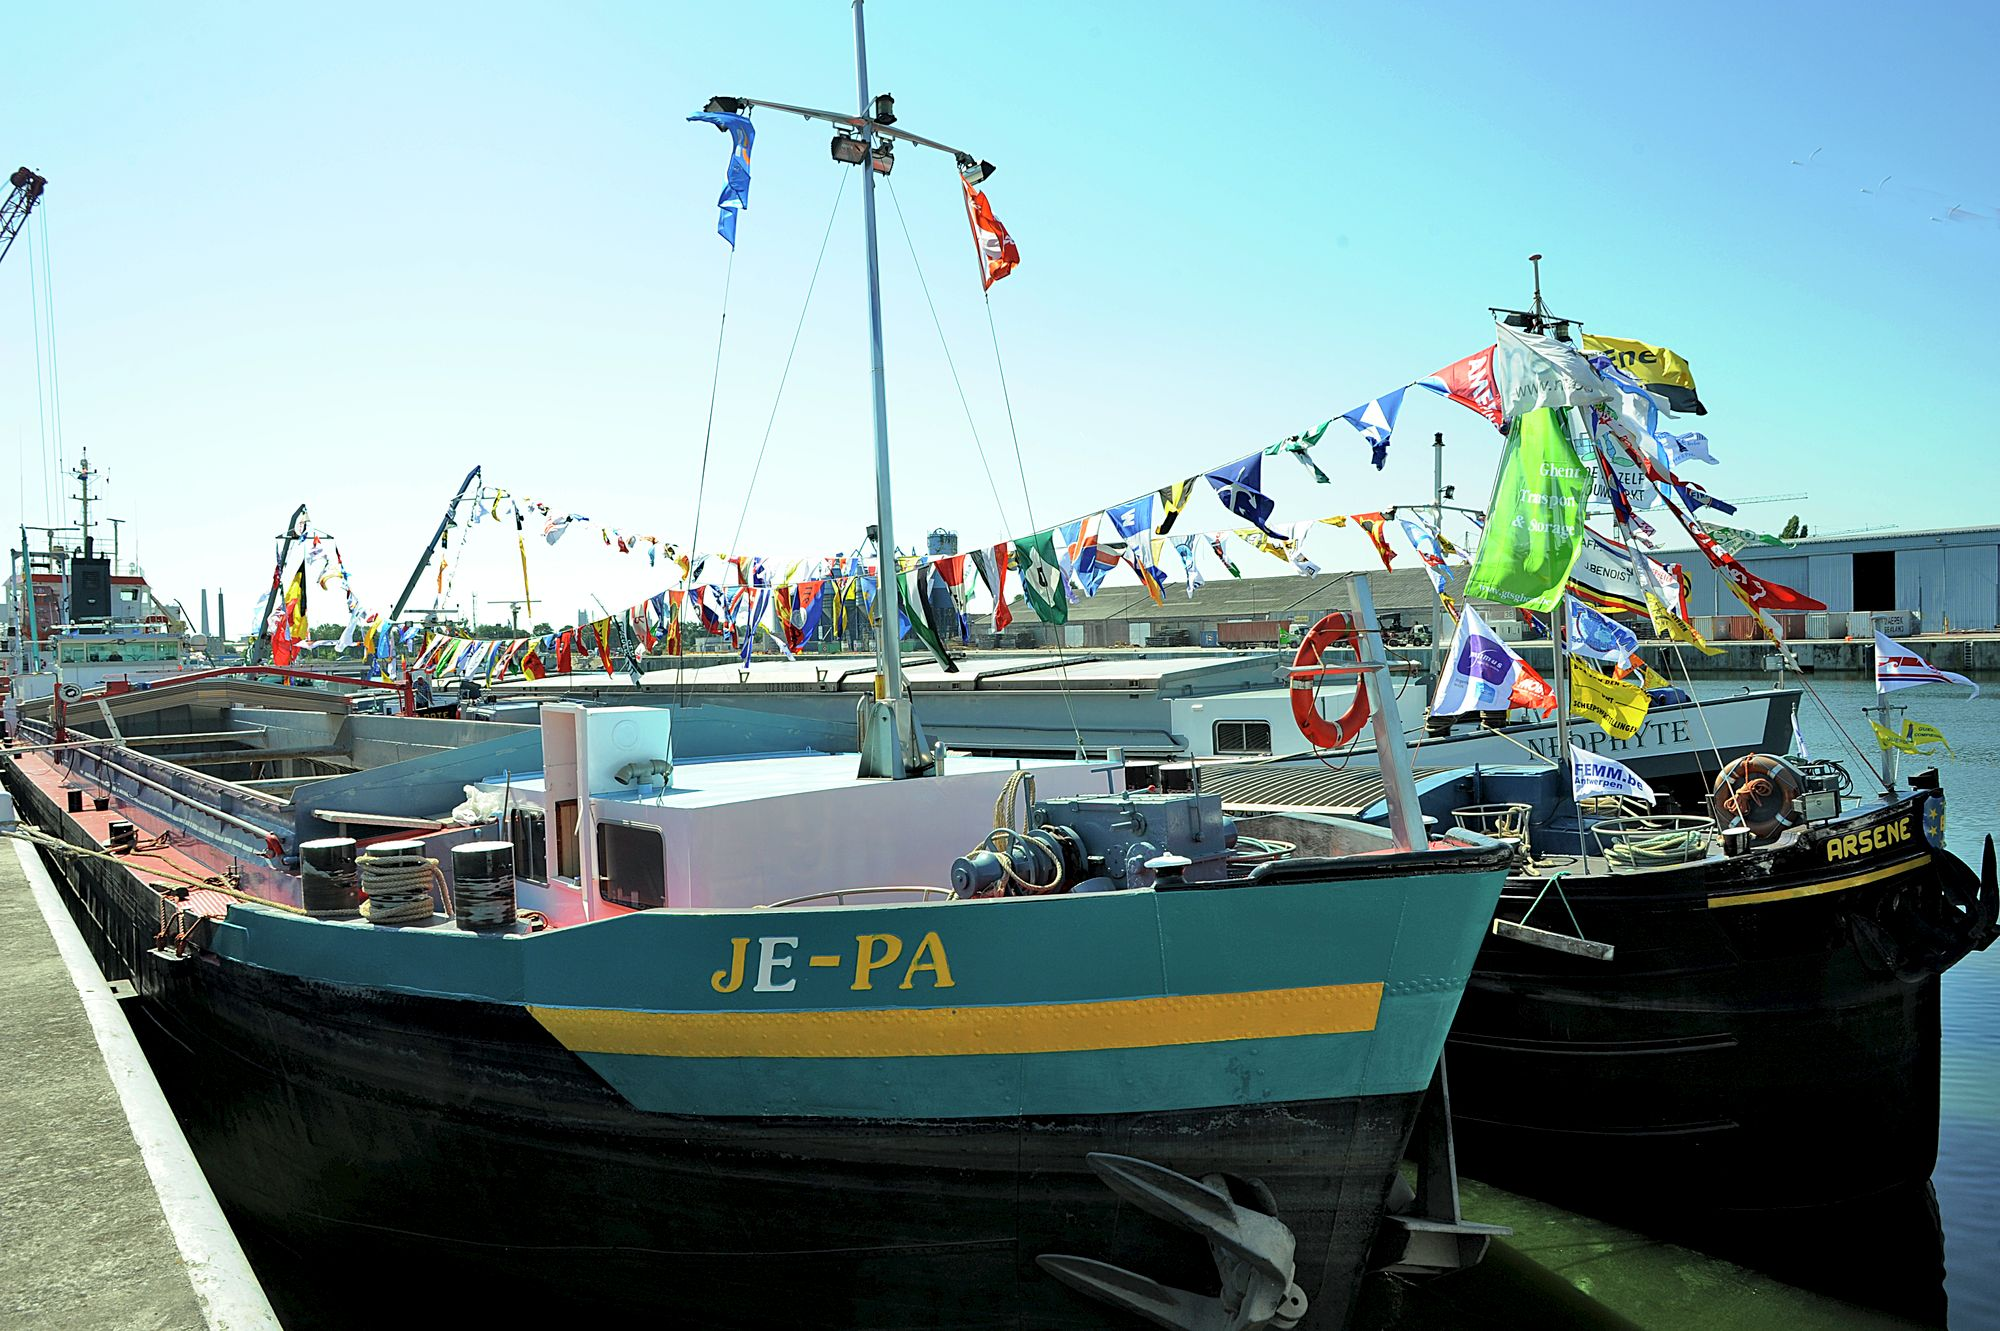 Vlaggen in de haven